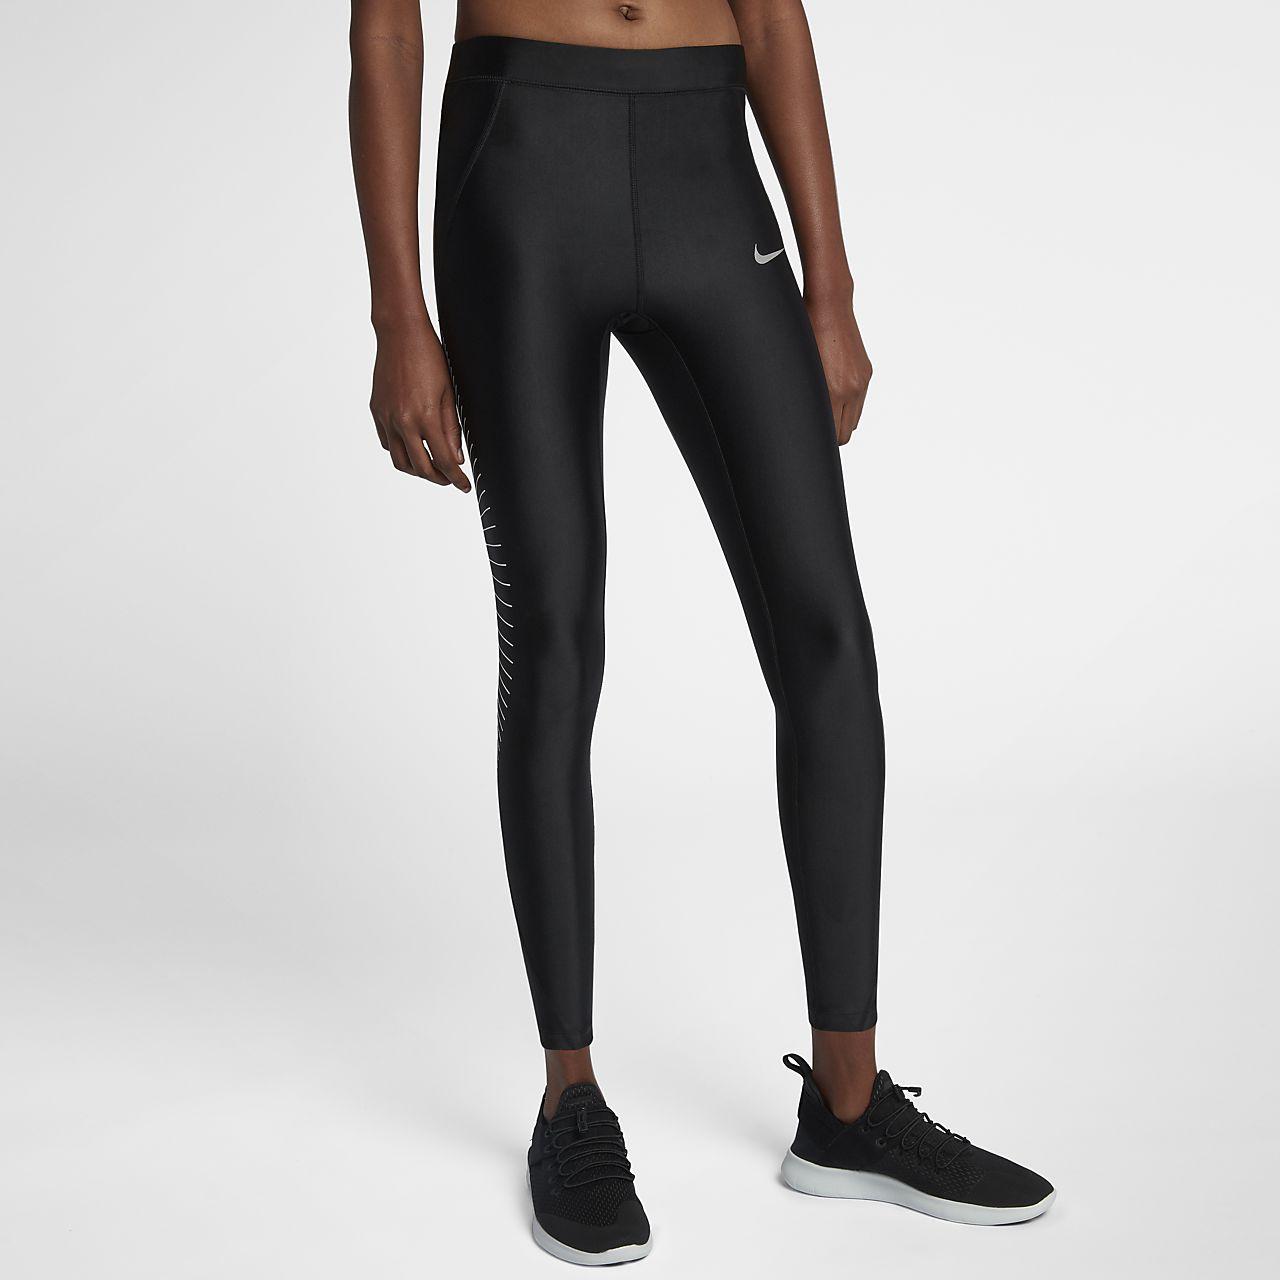 nike speed women 39 s running tights lu. Black Bedroom Furniture Sets. Home Design Ideas